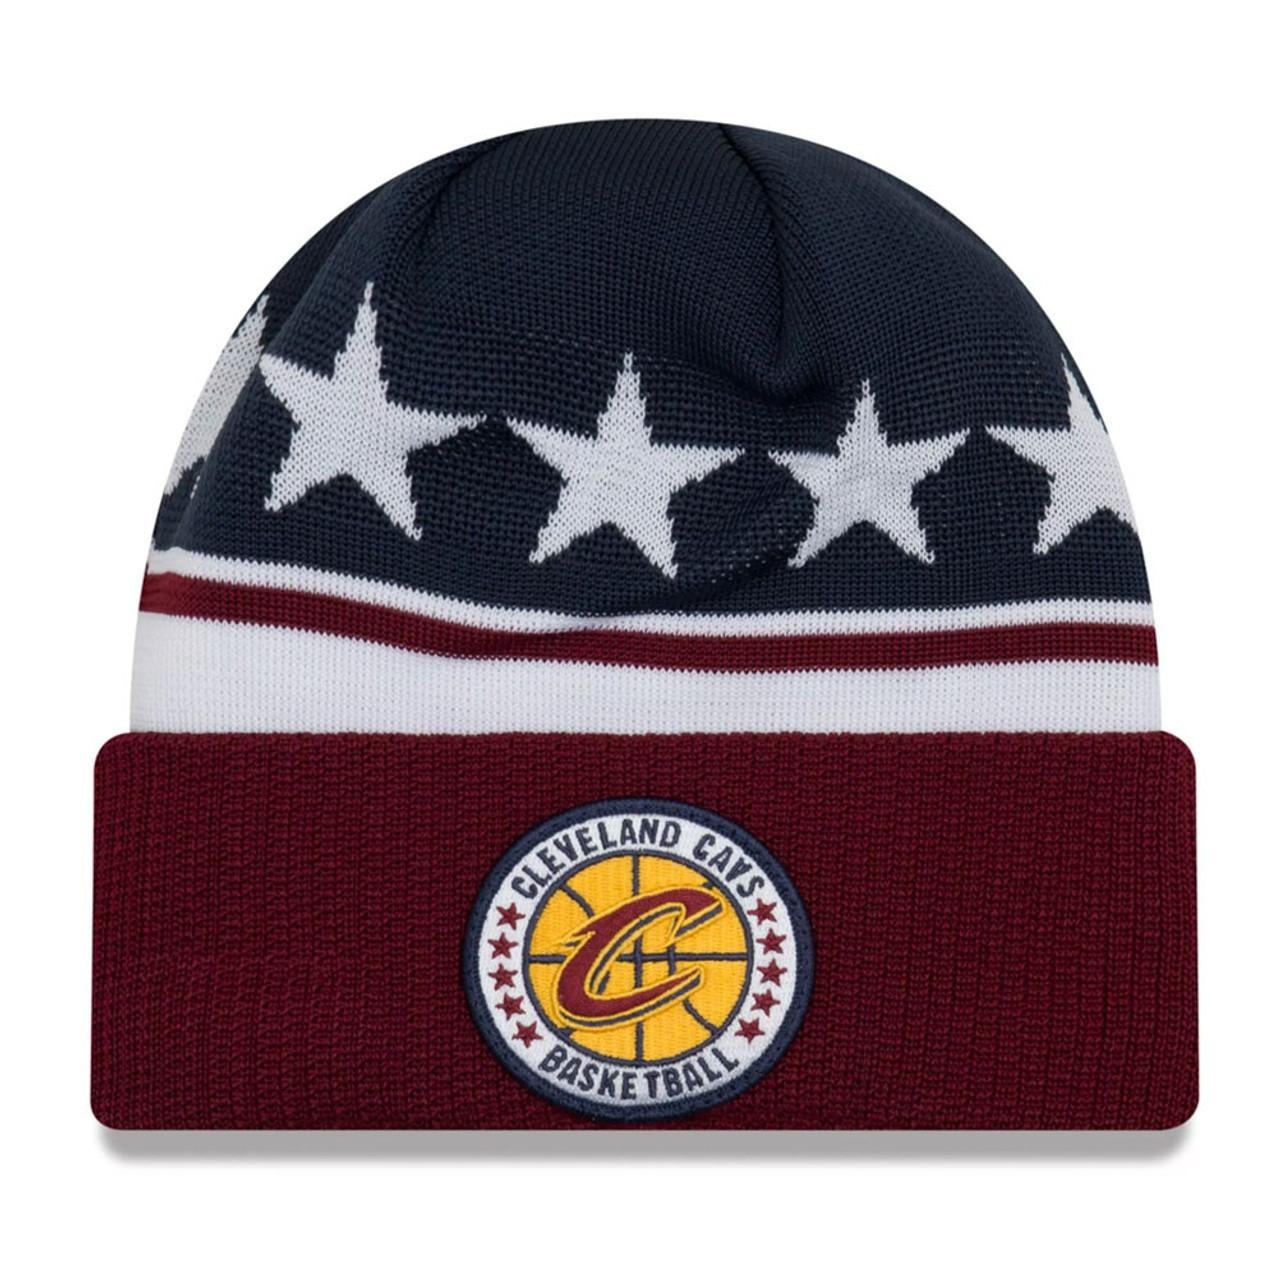 NEW ERA cleveland cavaliers NBA tip-off beanie hat  navy burgandy ... 391e2f68fe3f